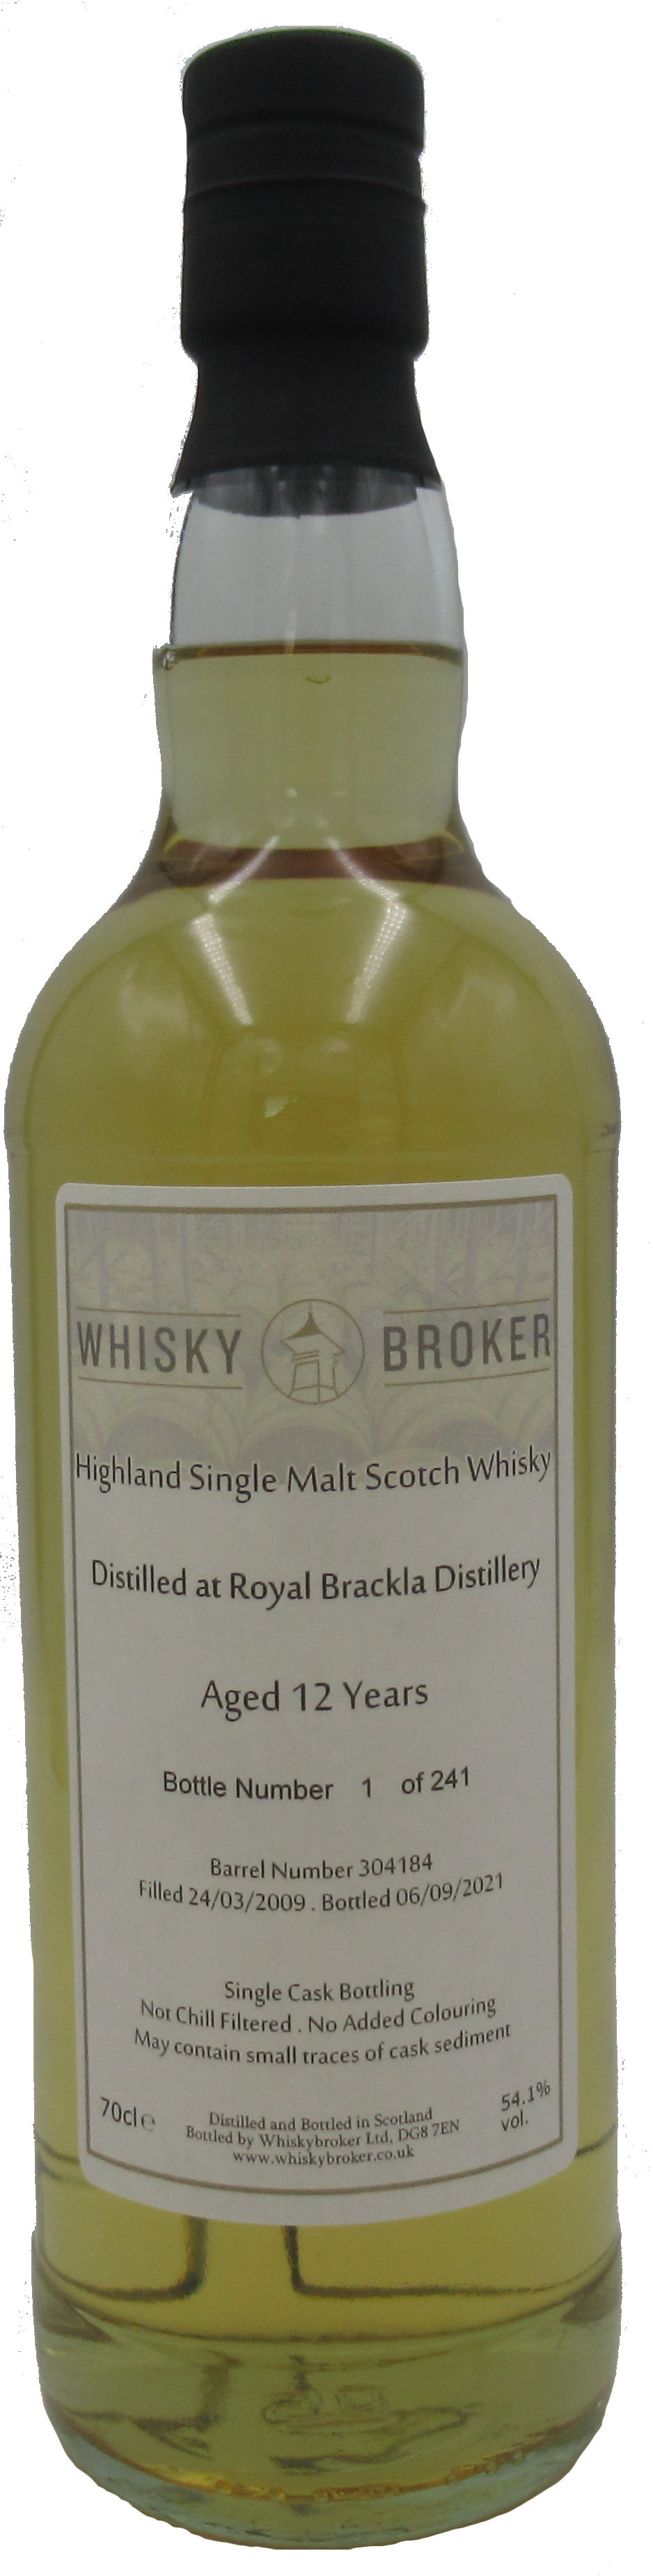 70cl, 12yo Distilled at Royal Brackla Distillery